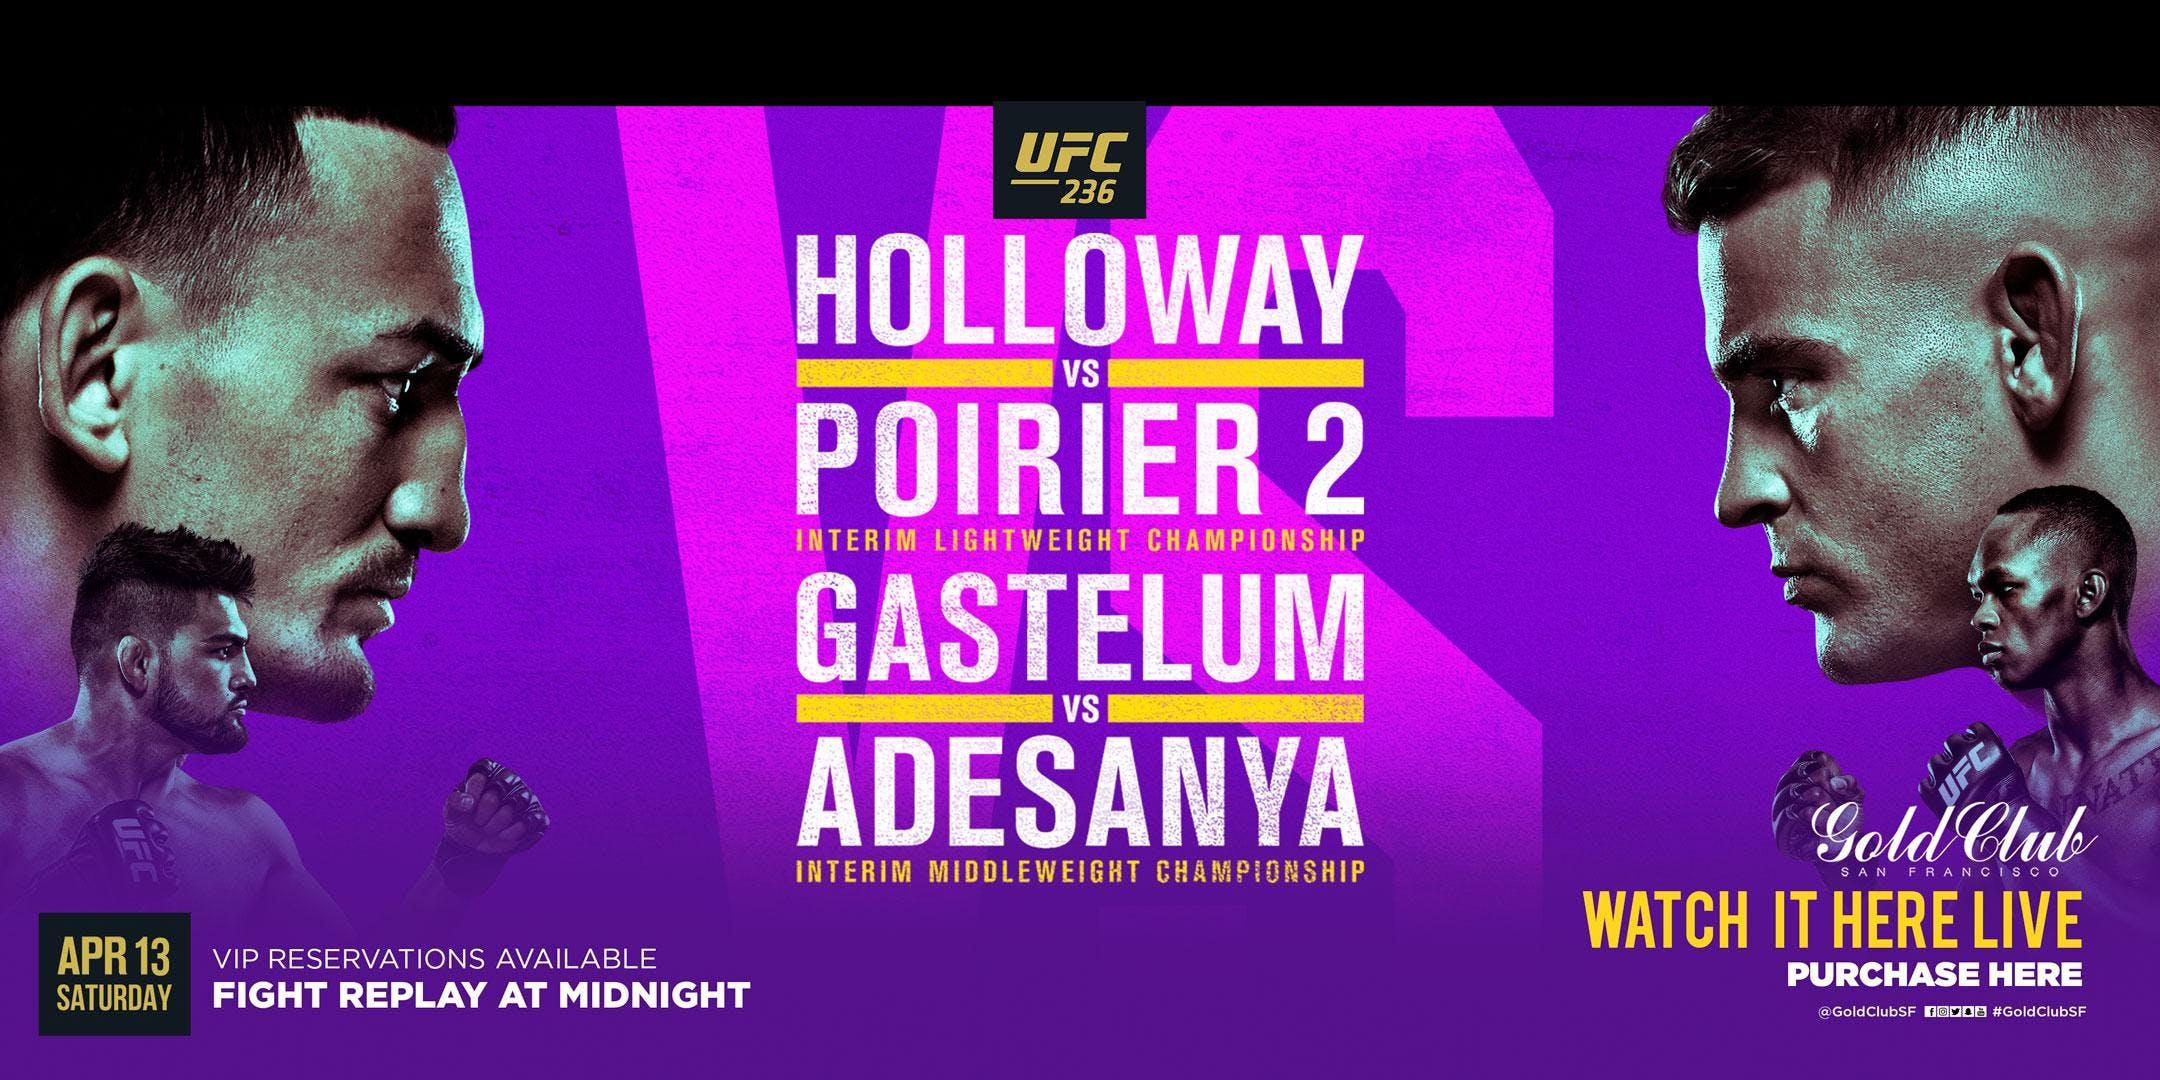 Watch UFC 236 Holloway vs. Poirier 2